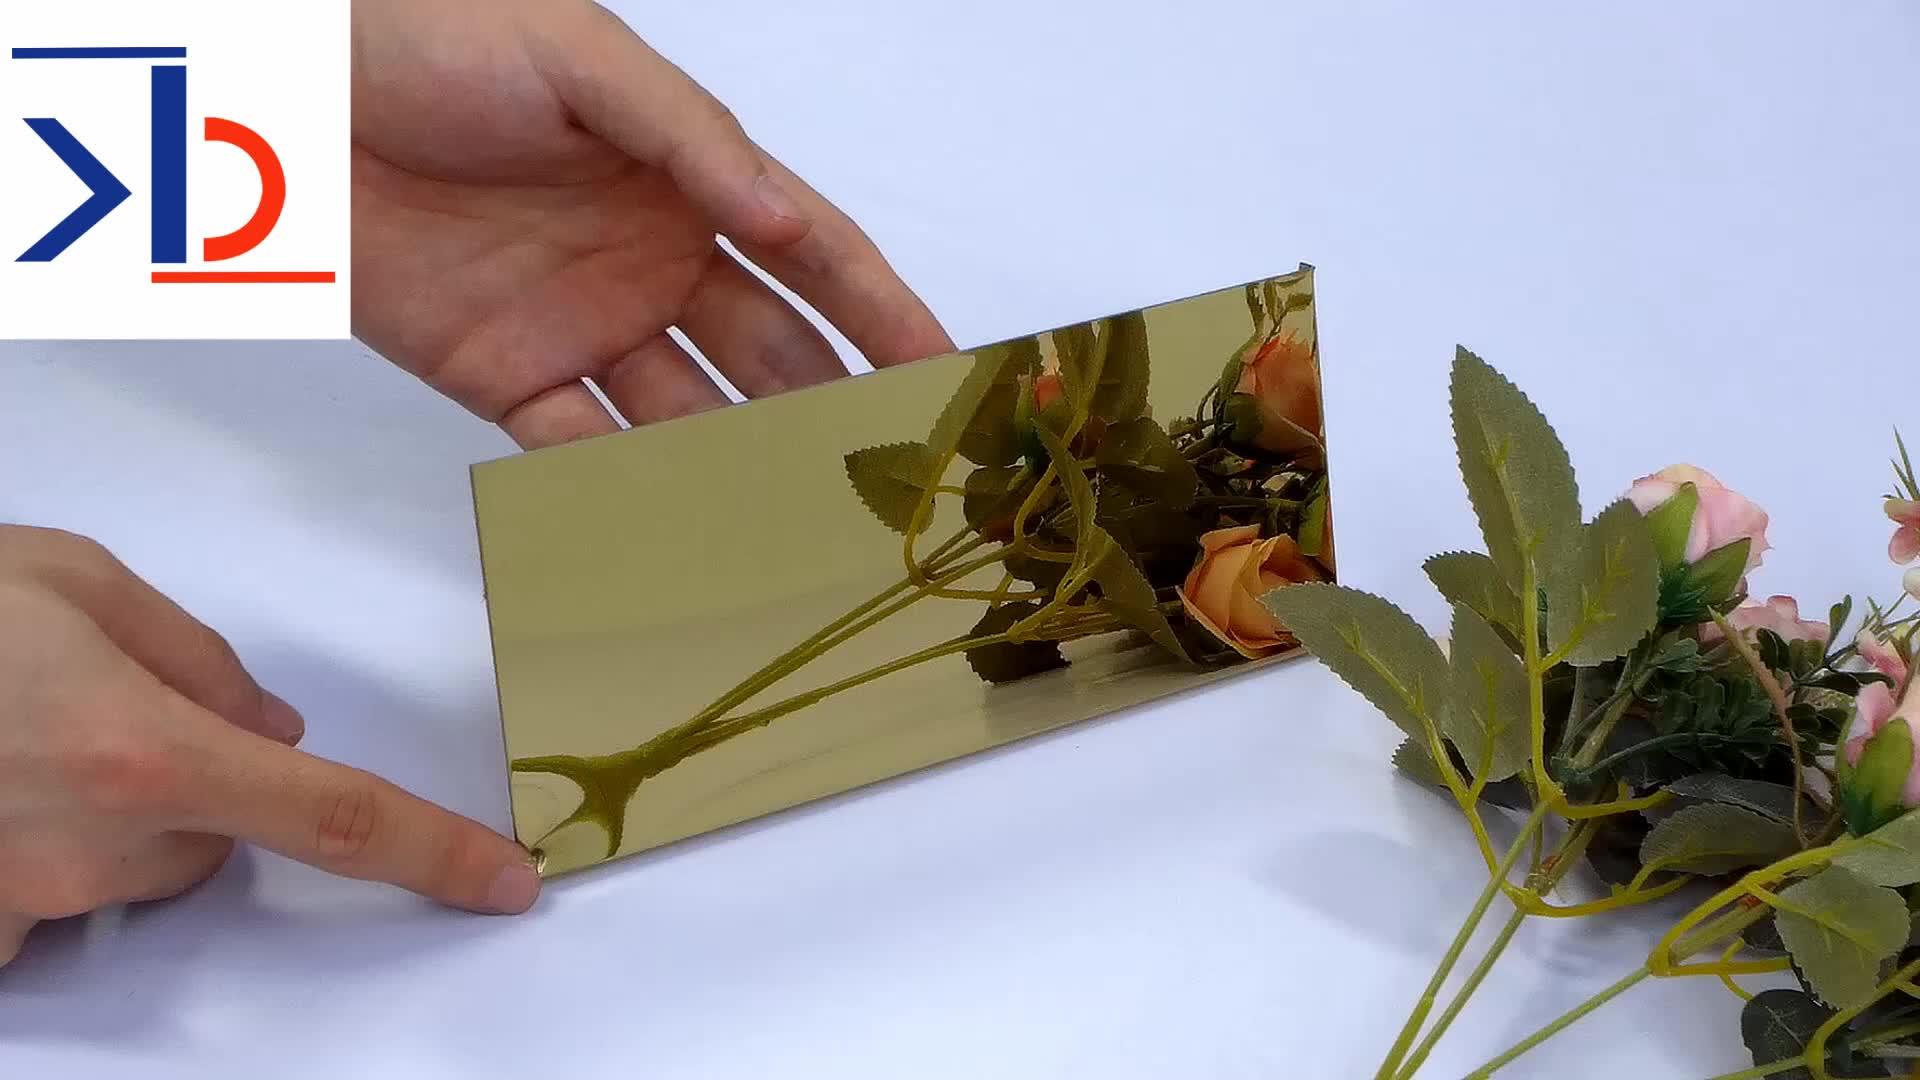 4x8 3mm 316l กระจกสแตนเลสแผ่น backsplash แผ่น 316 golden กระจกสีตกแต่งสแตนเลสแผ่น